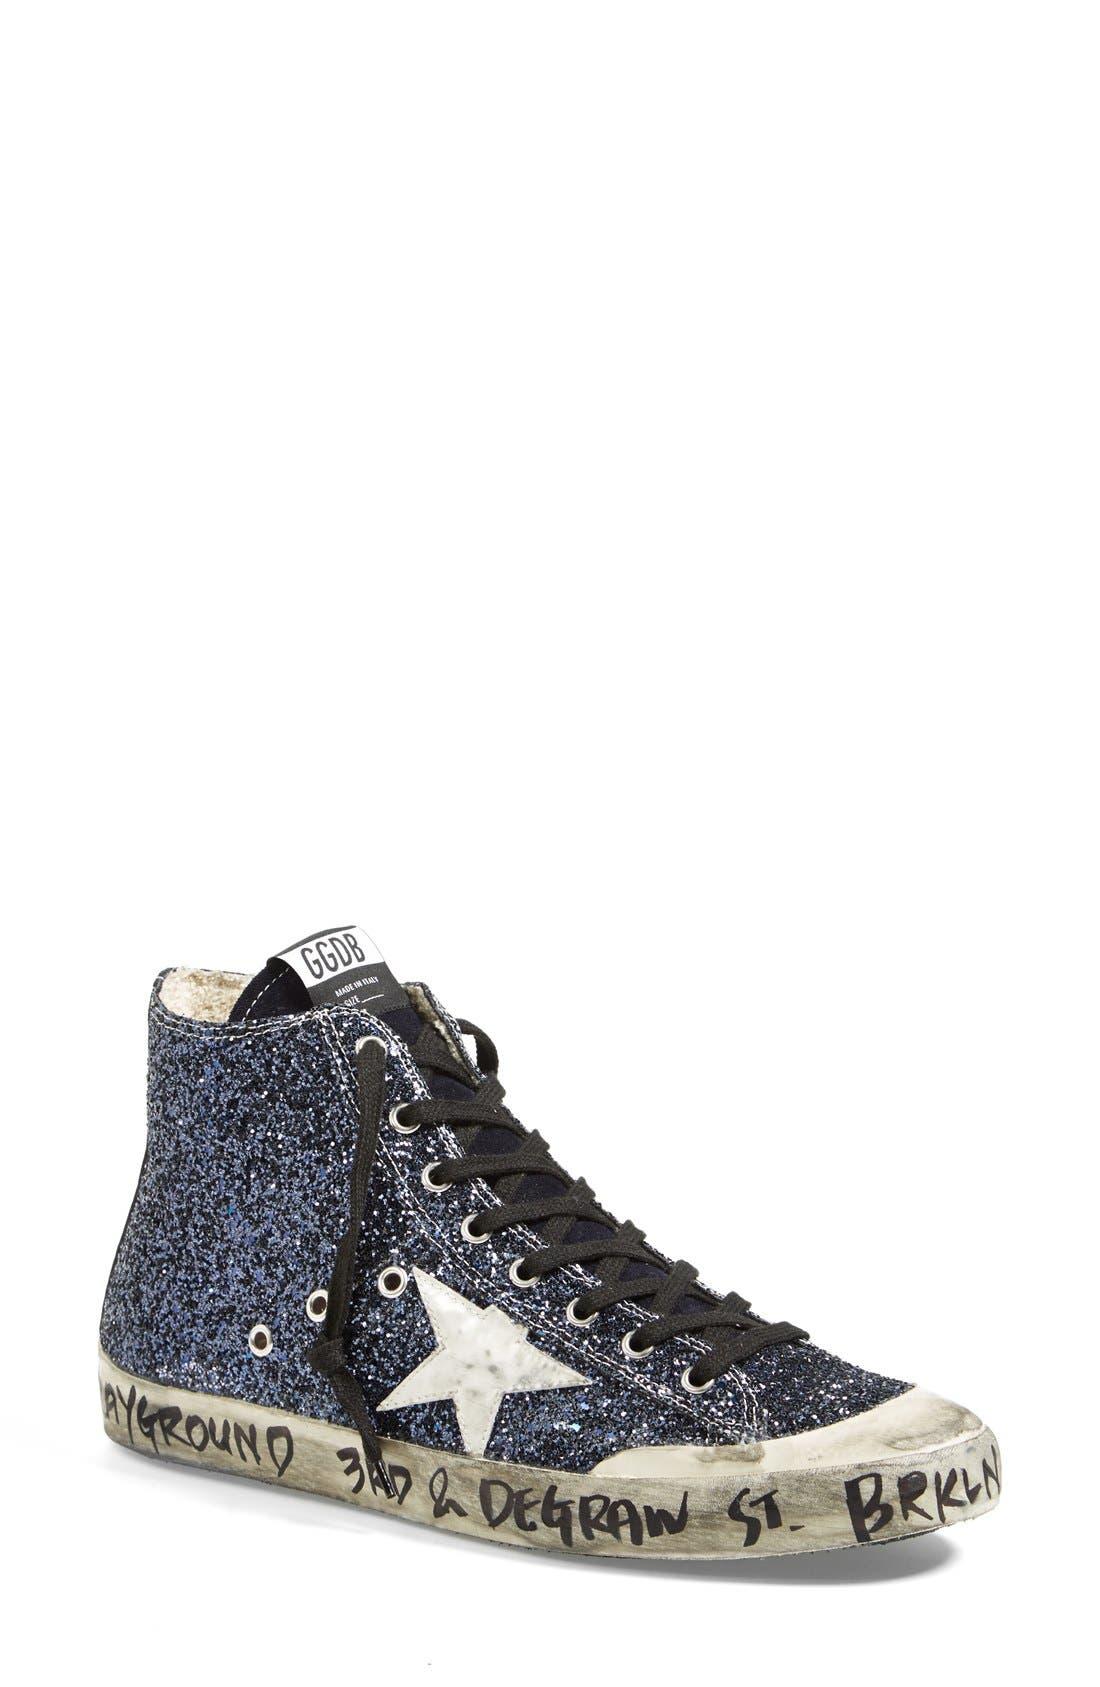 Alternate Image 1 Selected - Golden Goose 'Francy' Sneaker (Women)